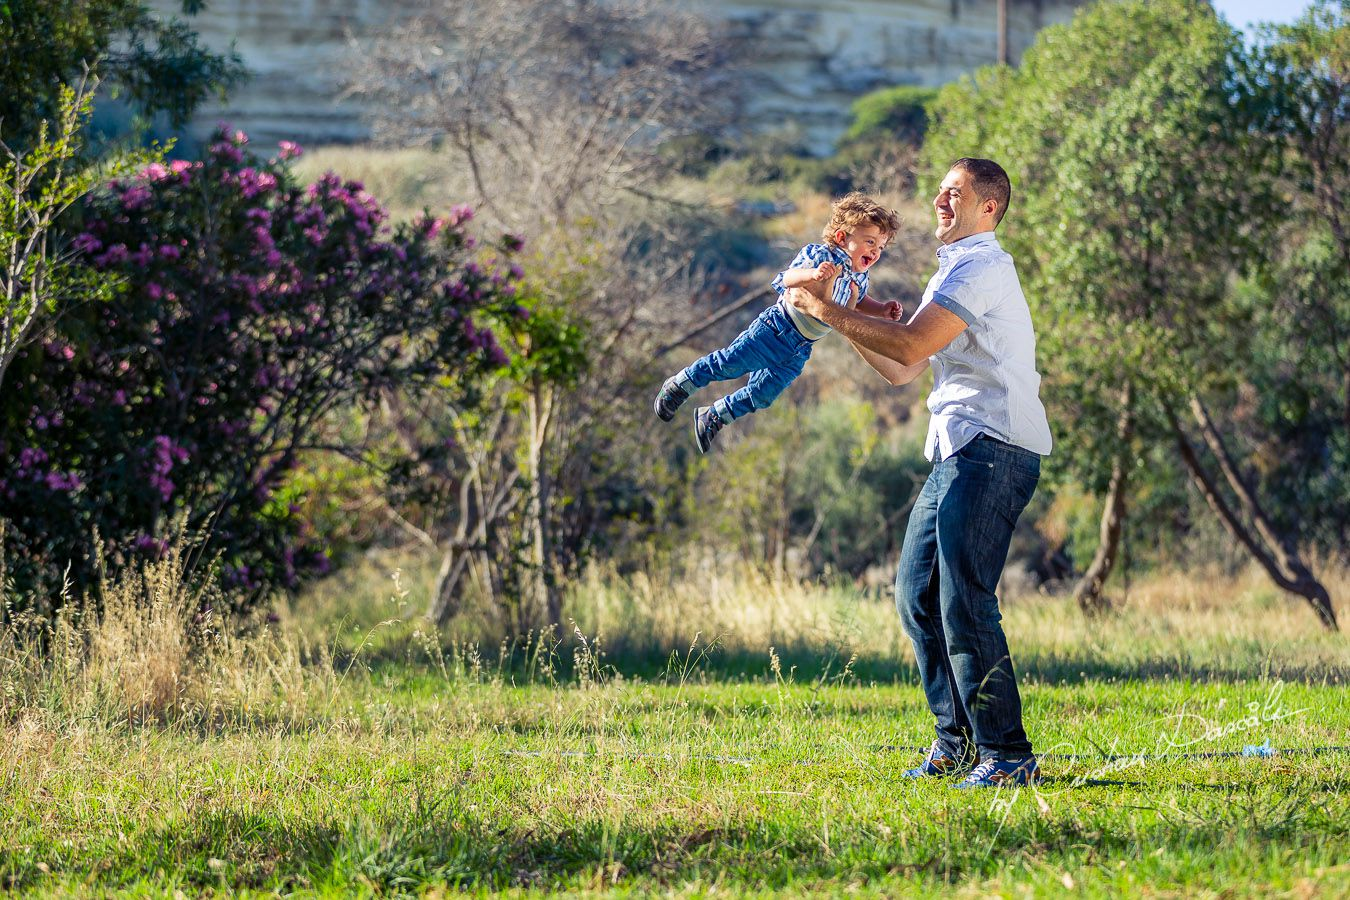 George & Harry playing near Curium Beach, Cyprus. Photographer: Cristian Dascalu